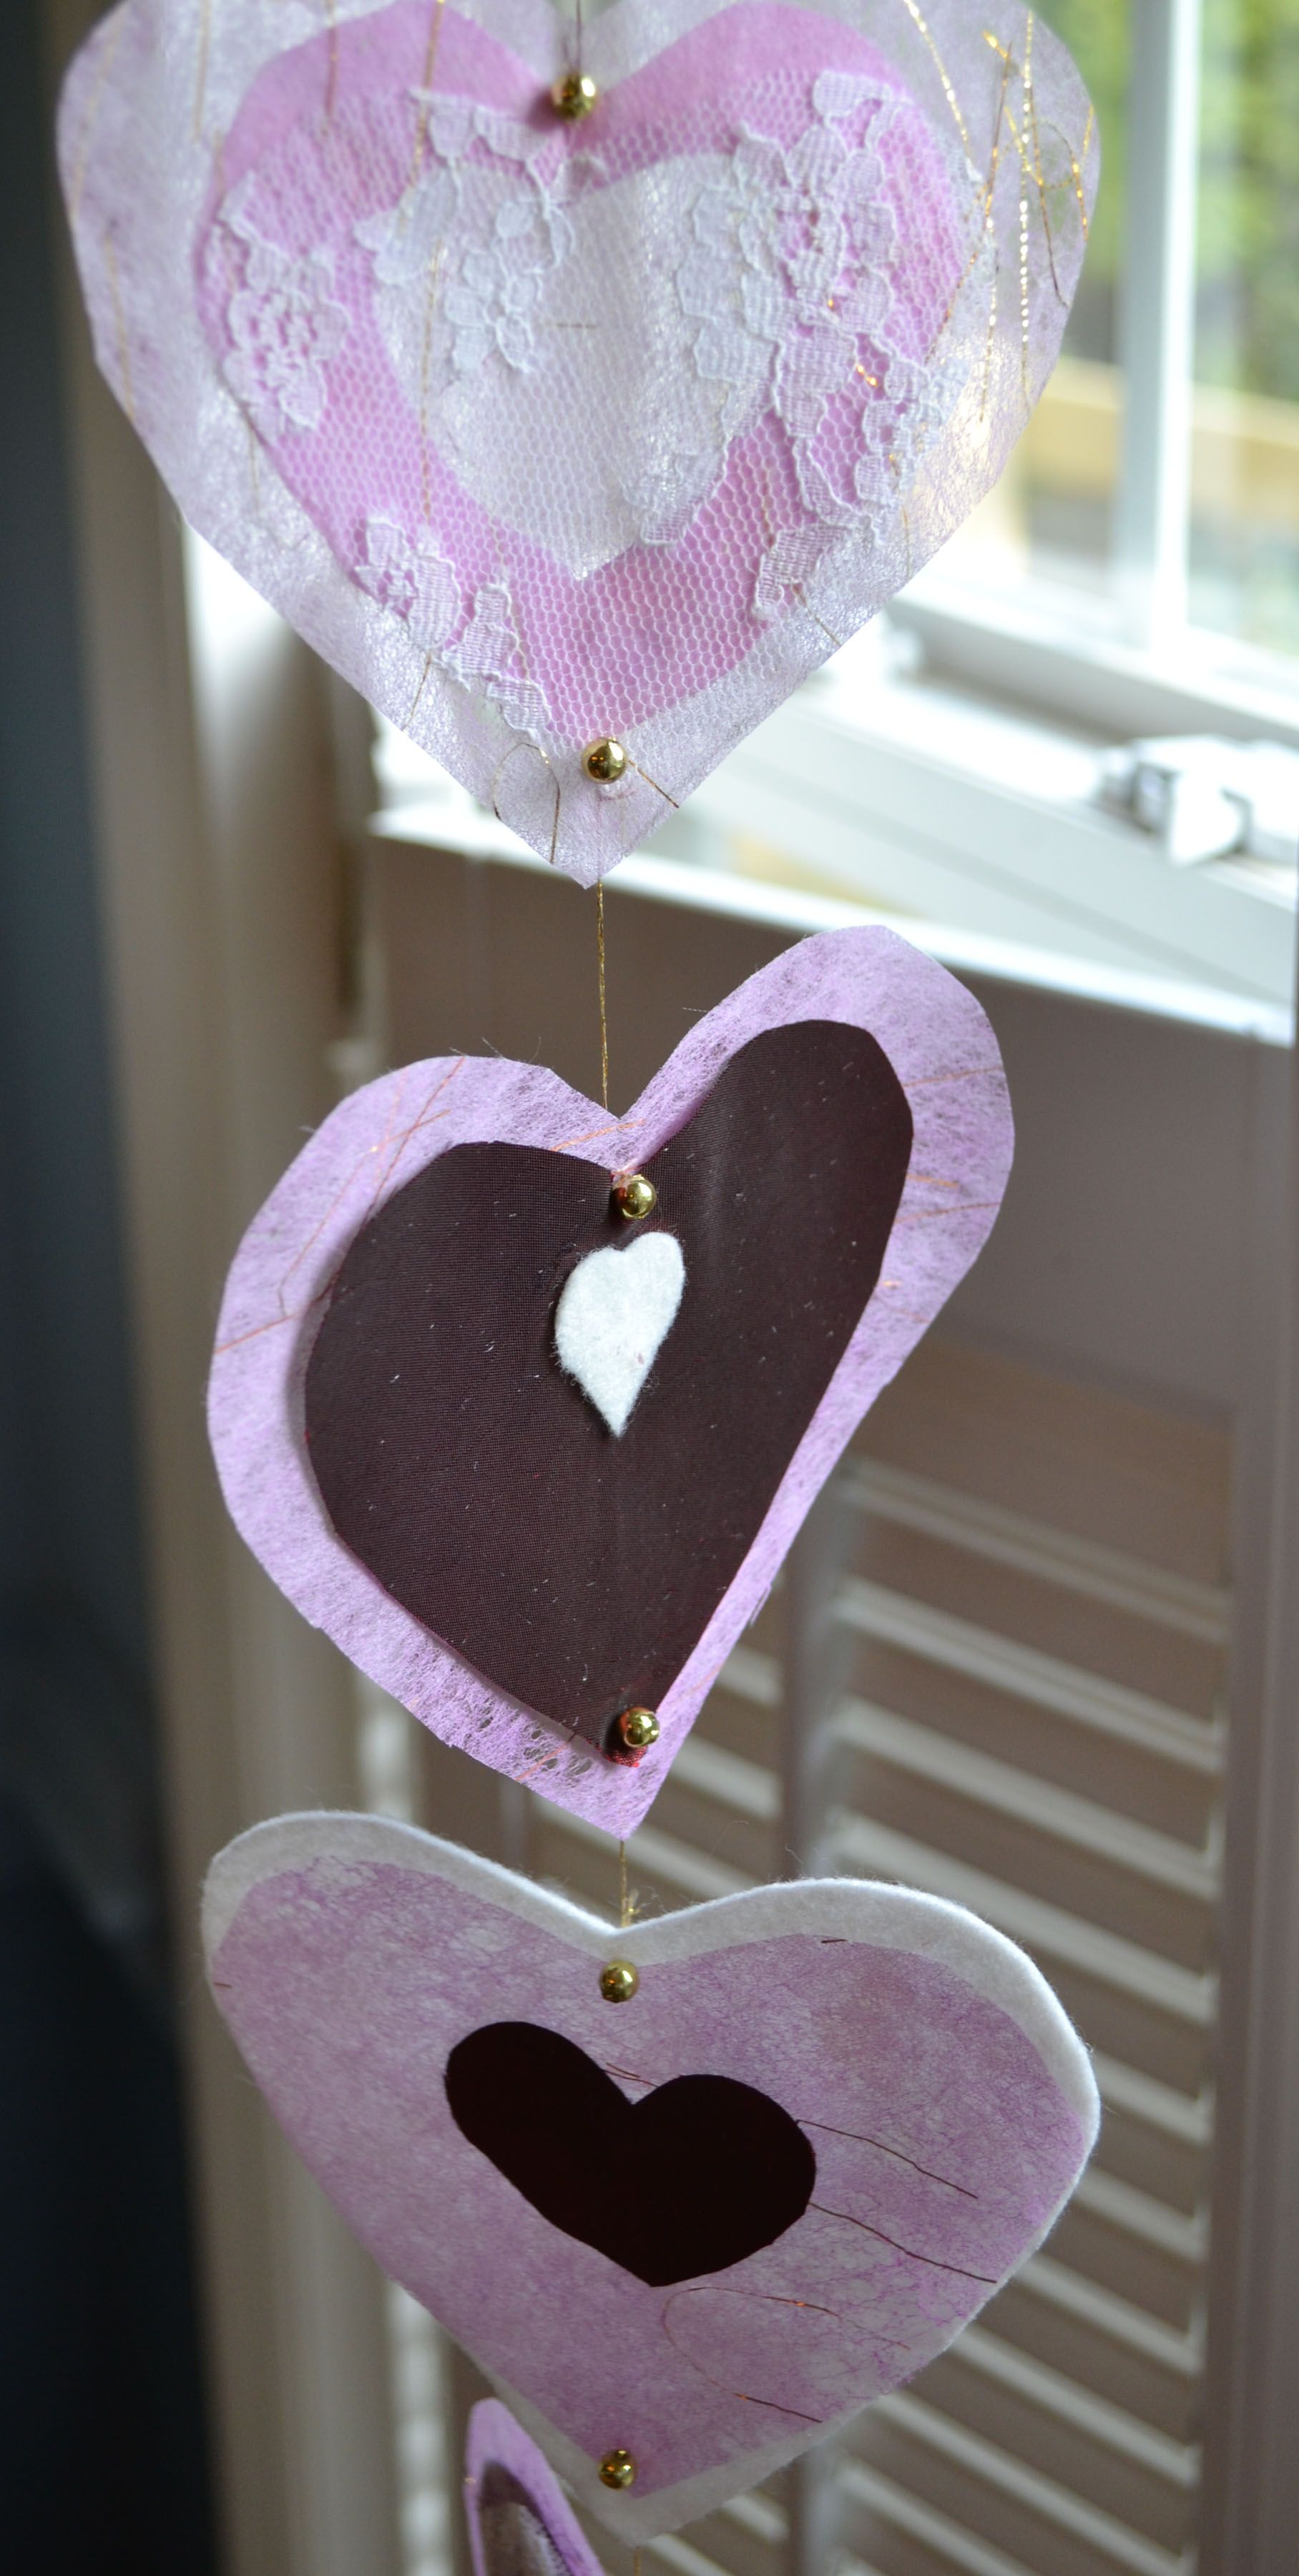 Valentine's decorations.